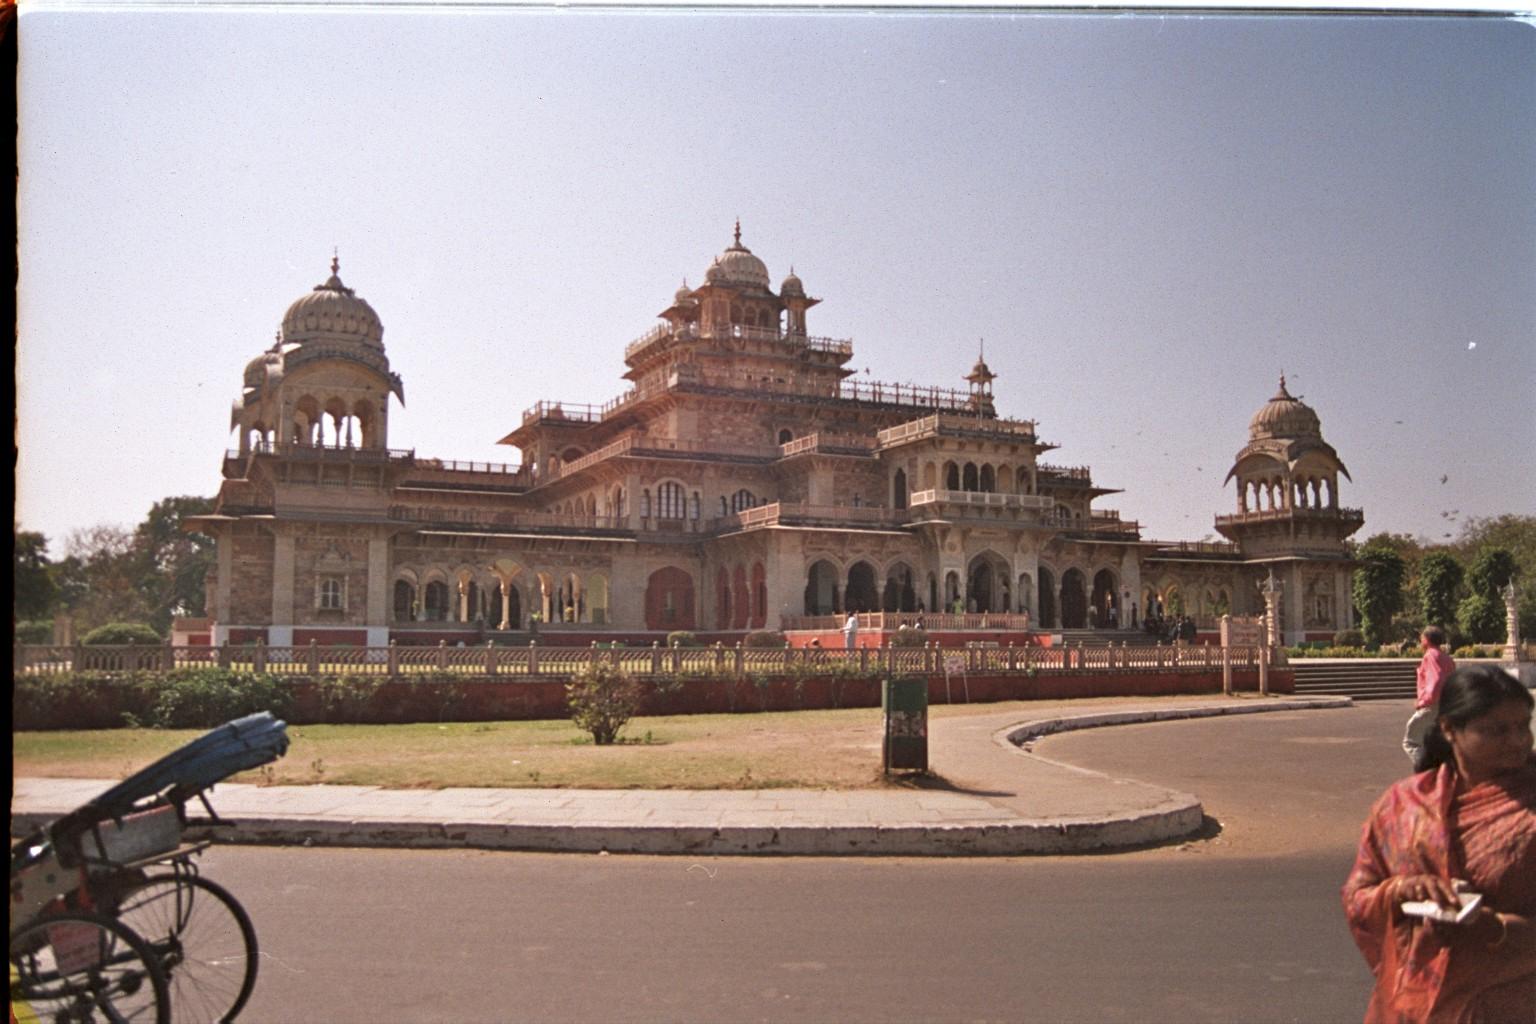 Jaipur Central Museum